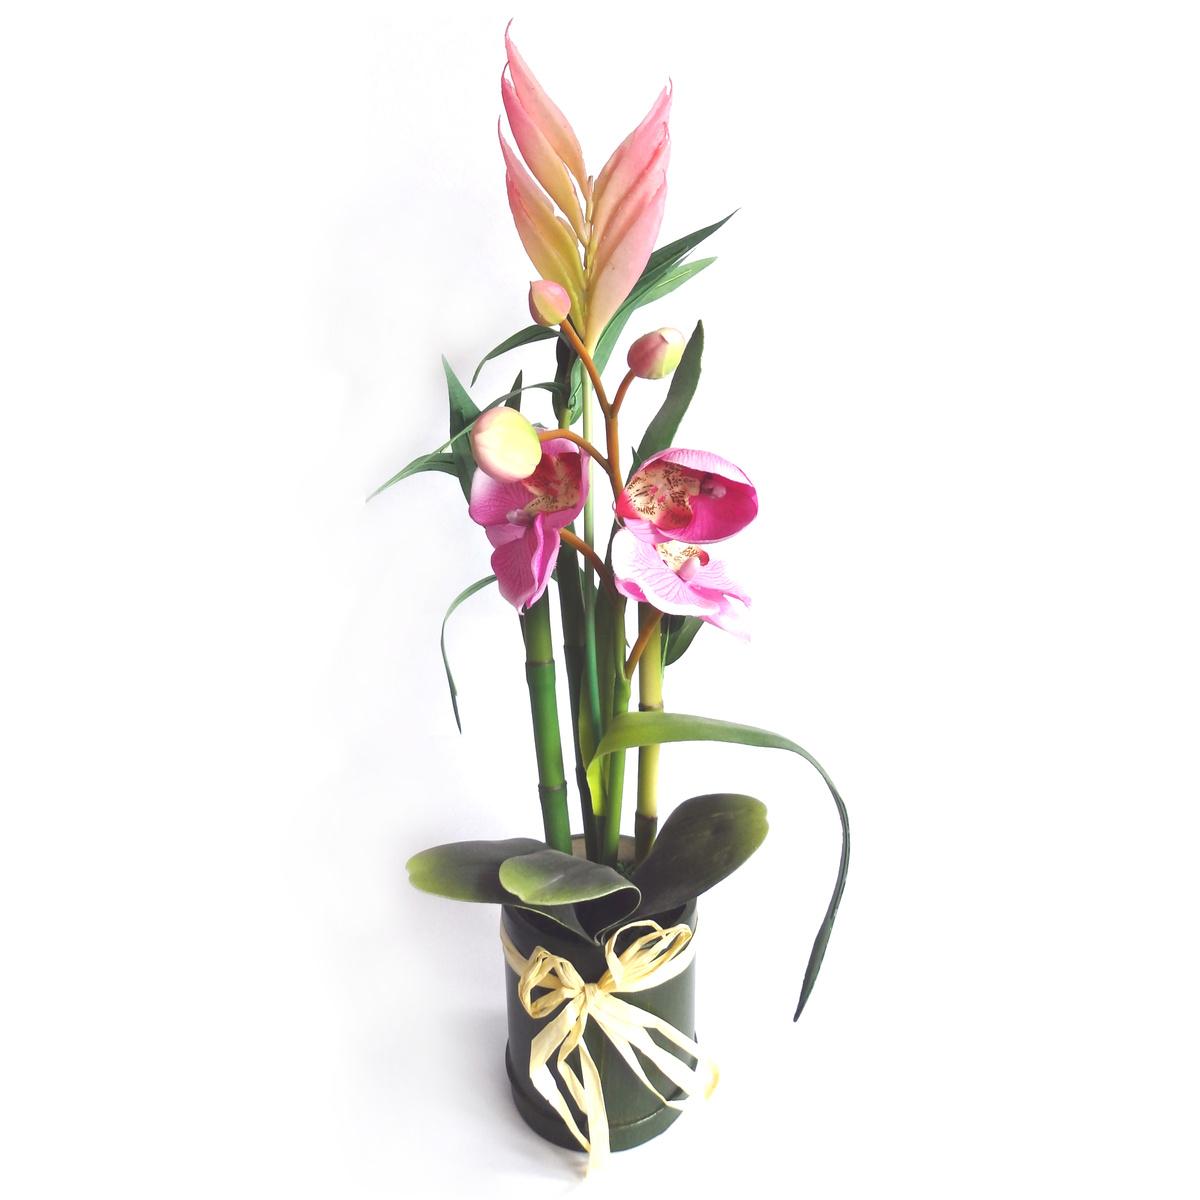 Umělá kytice orchidea, bambus